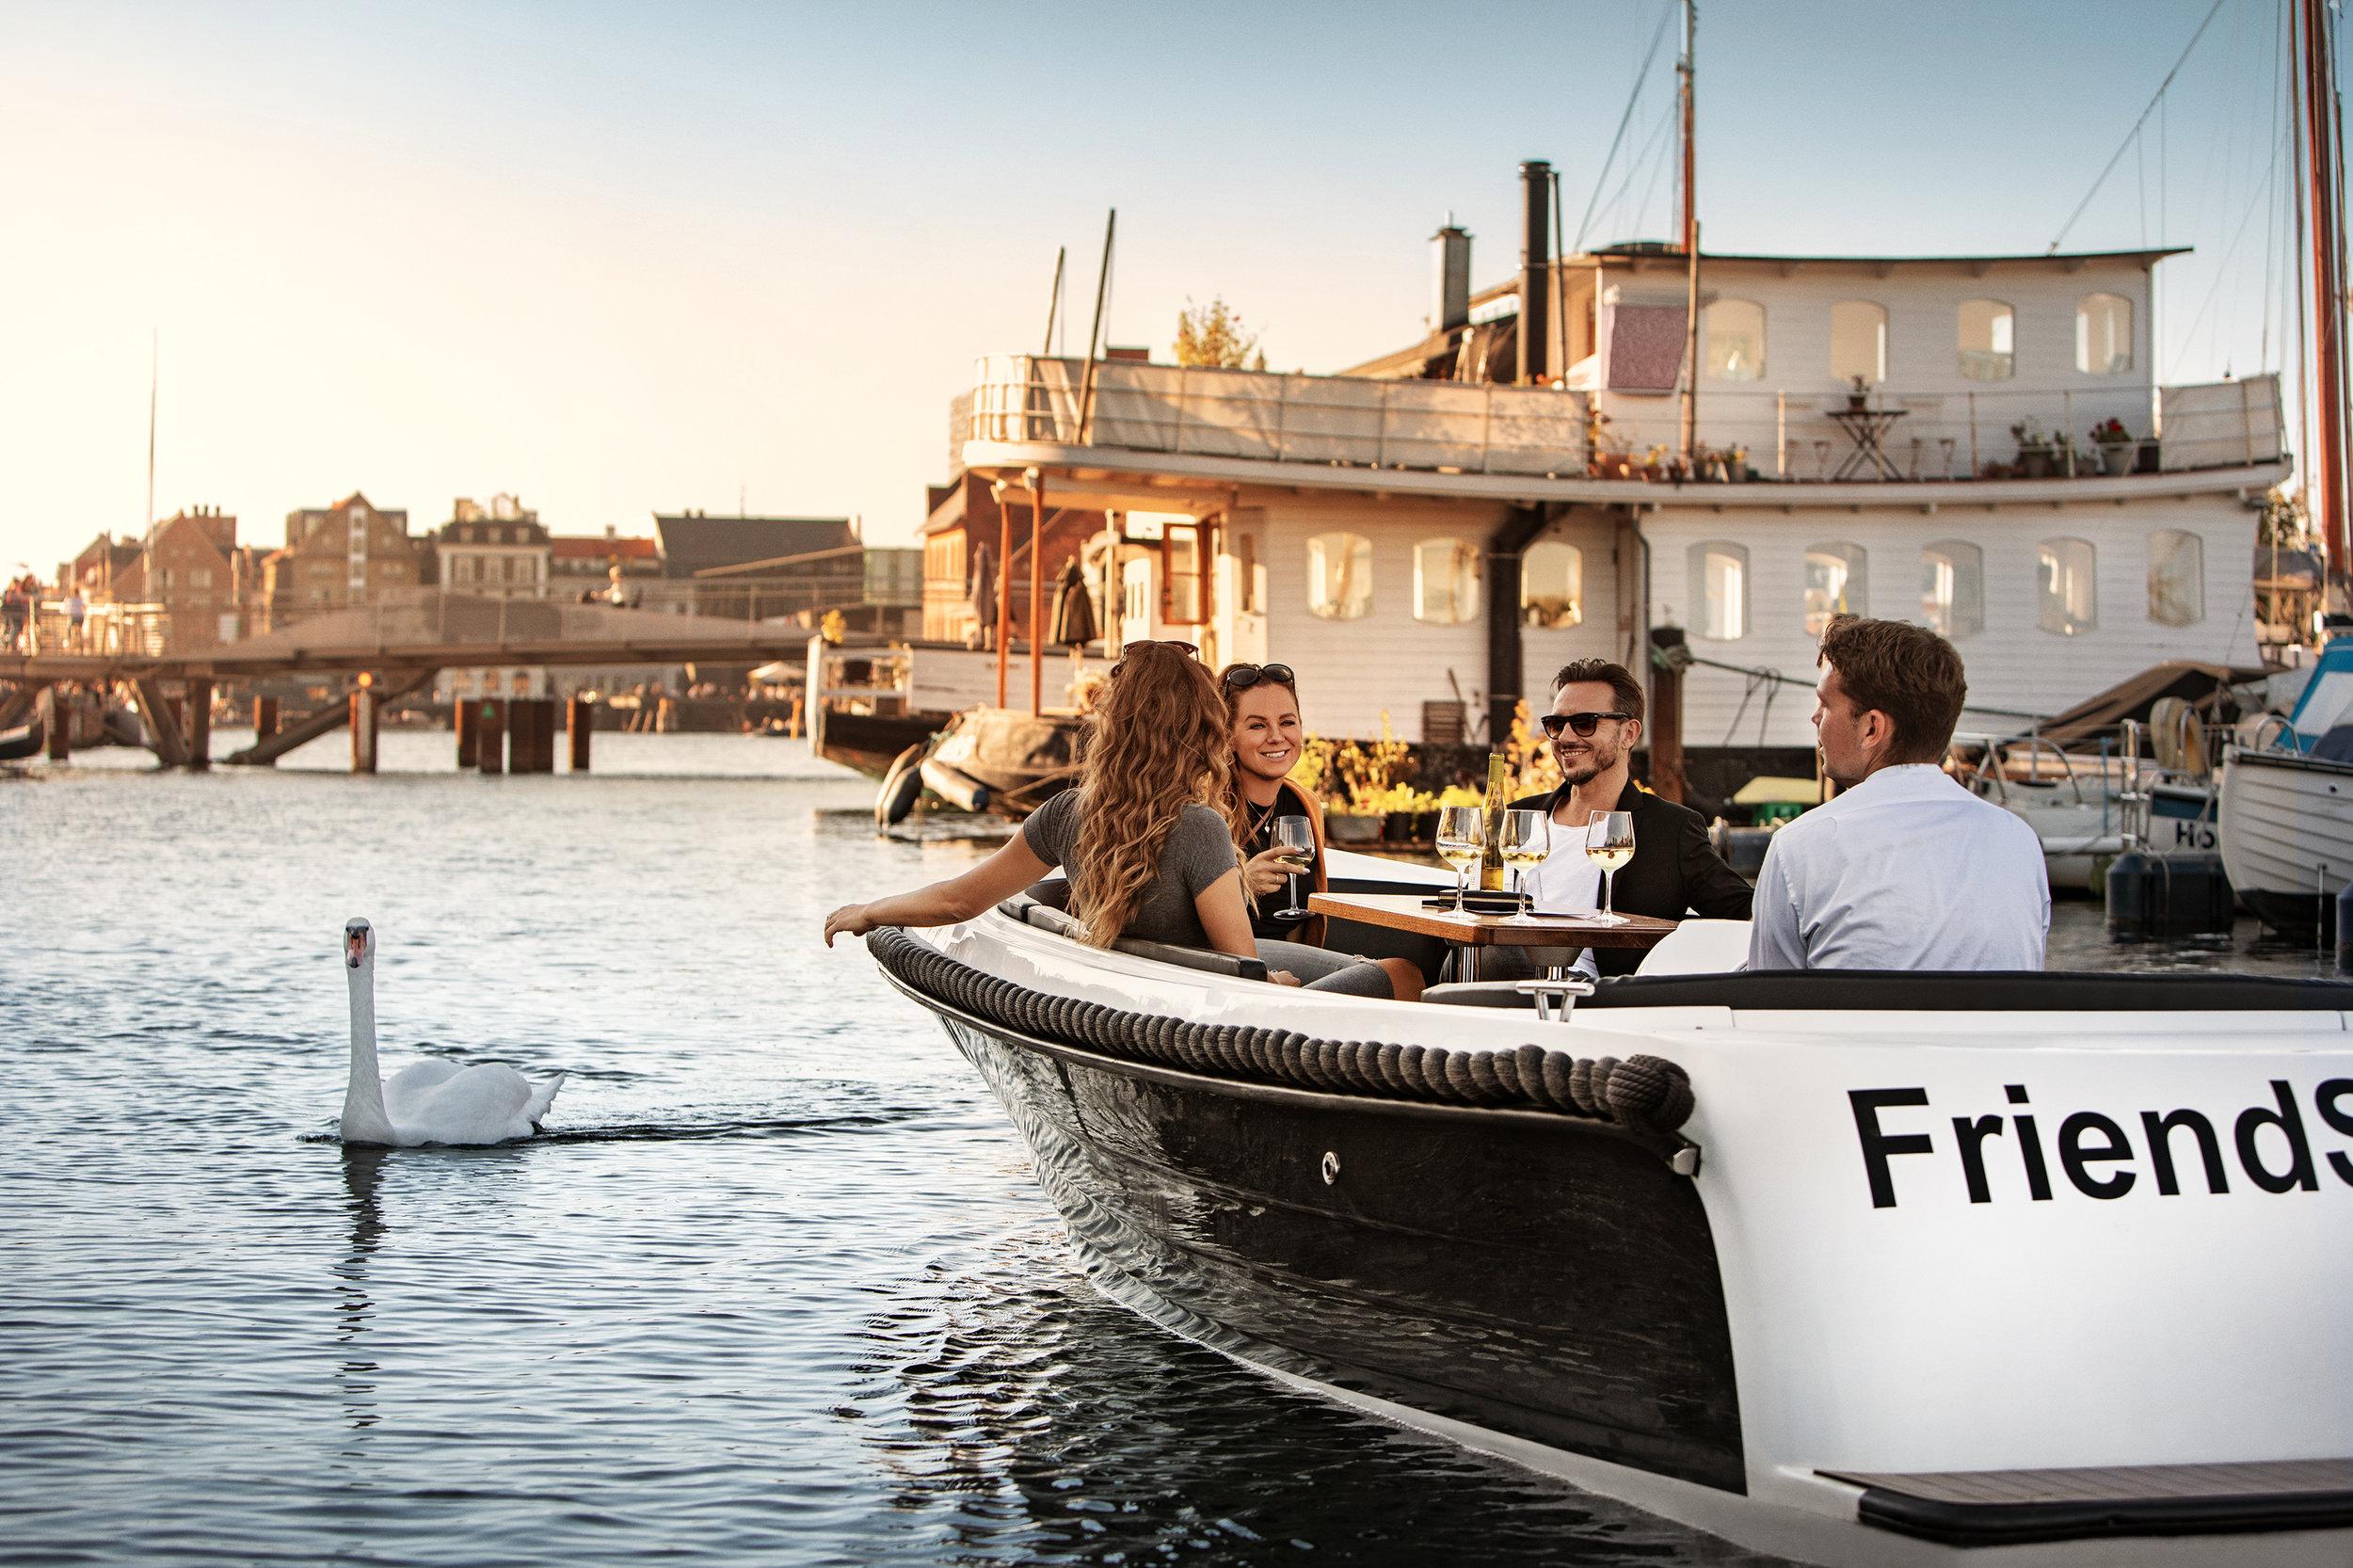 boat_rental_software_denmark.jpg